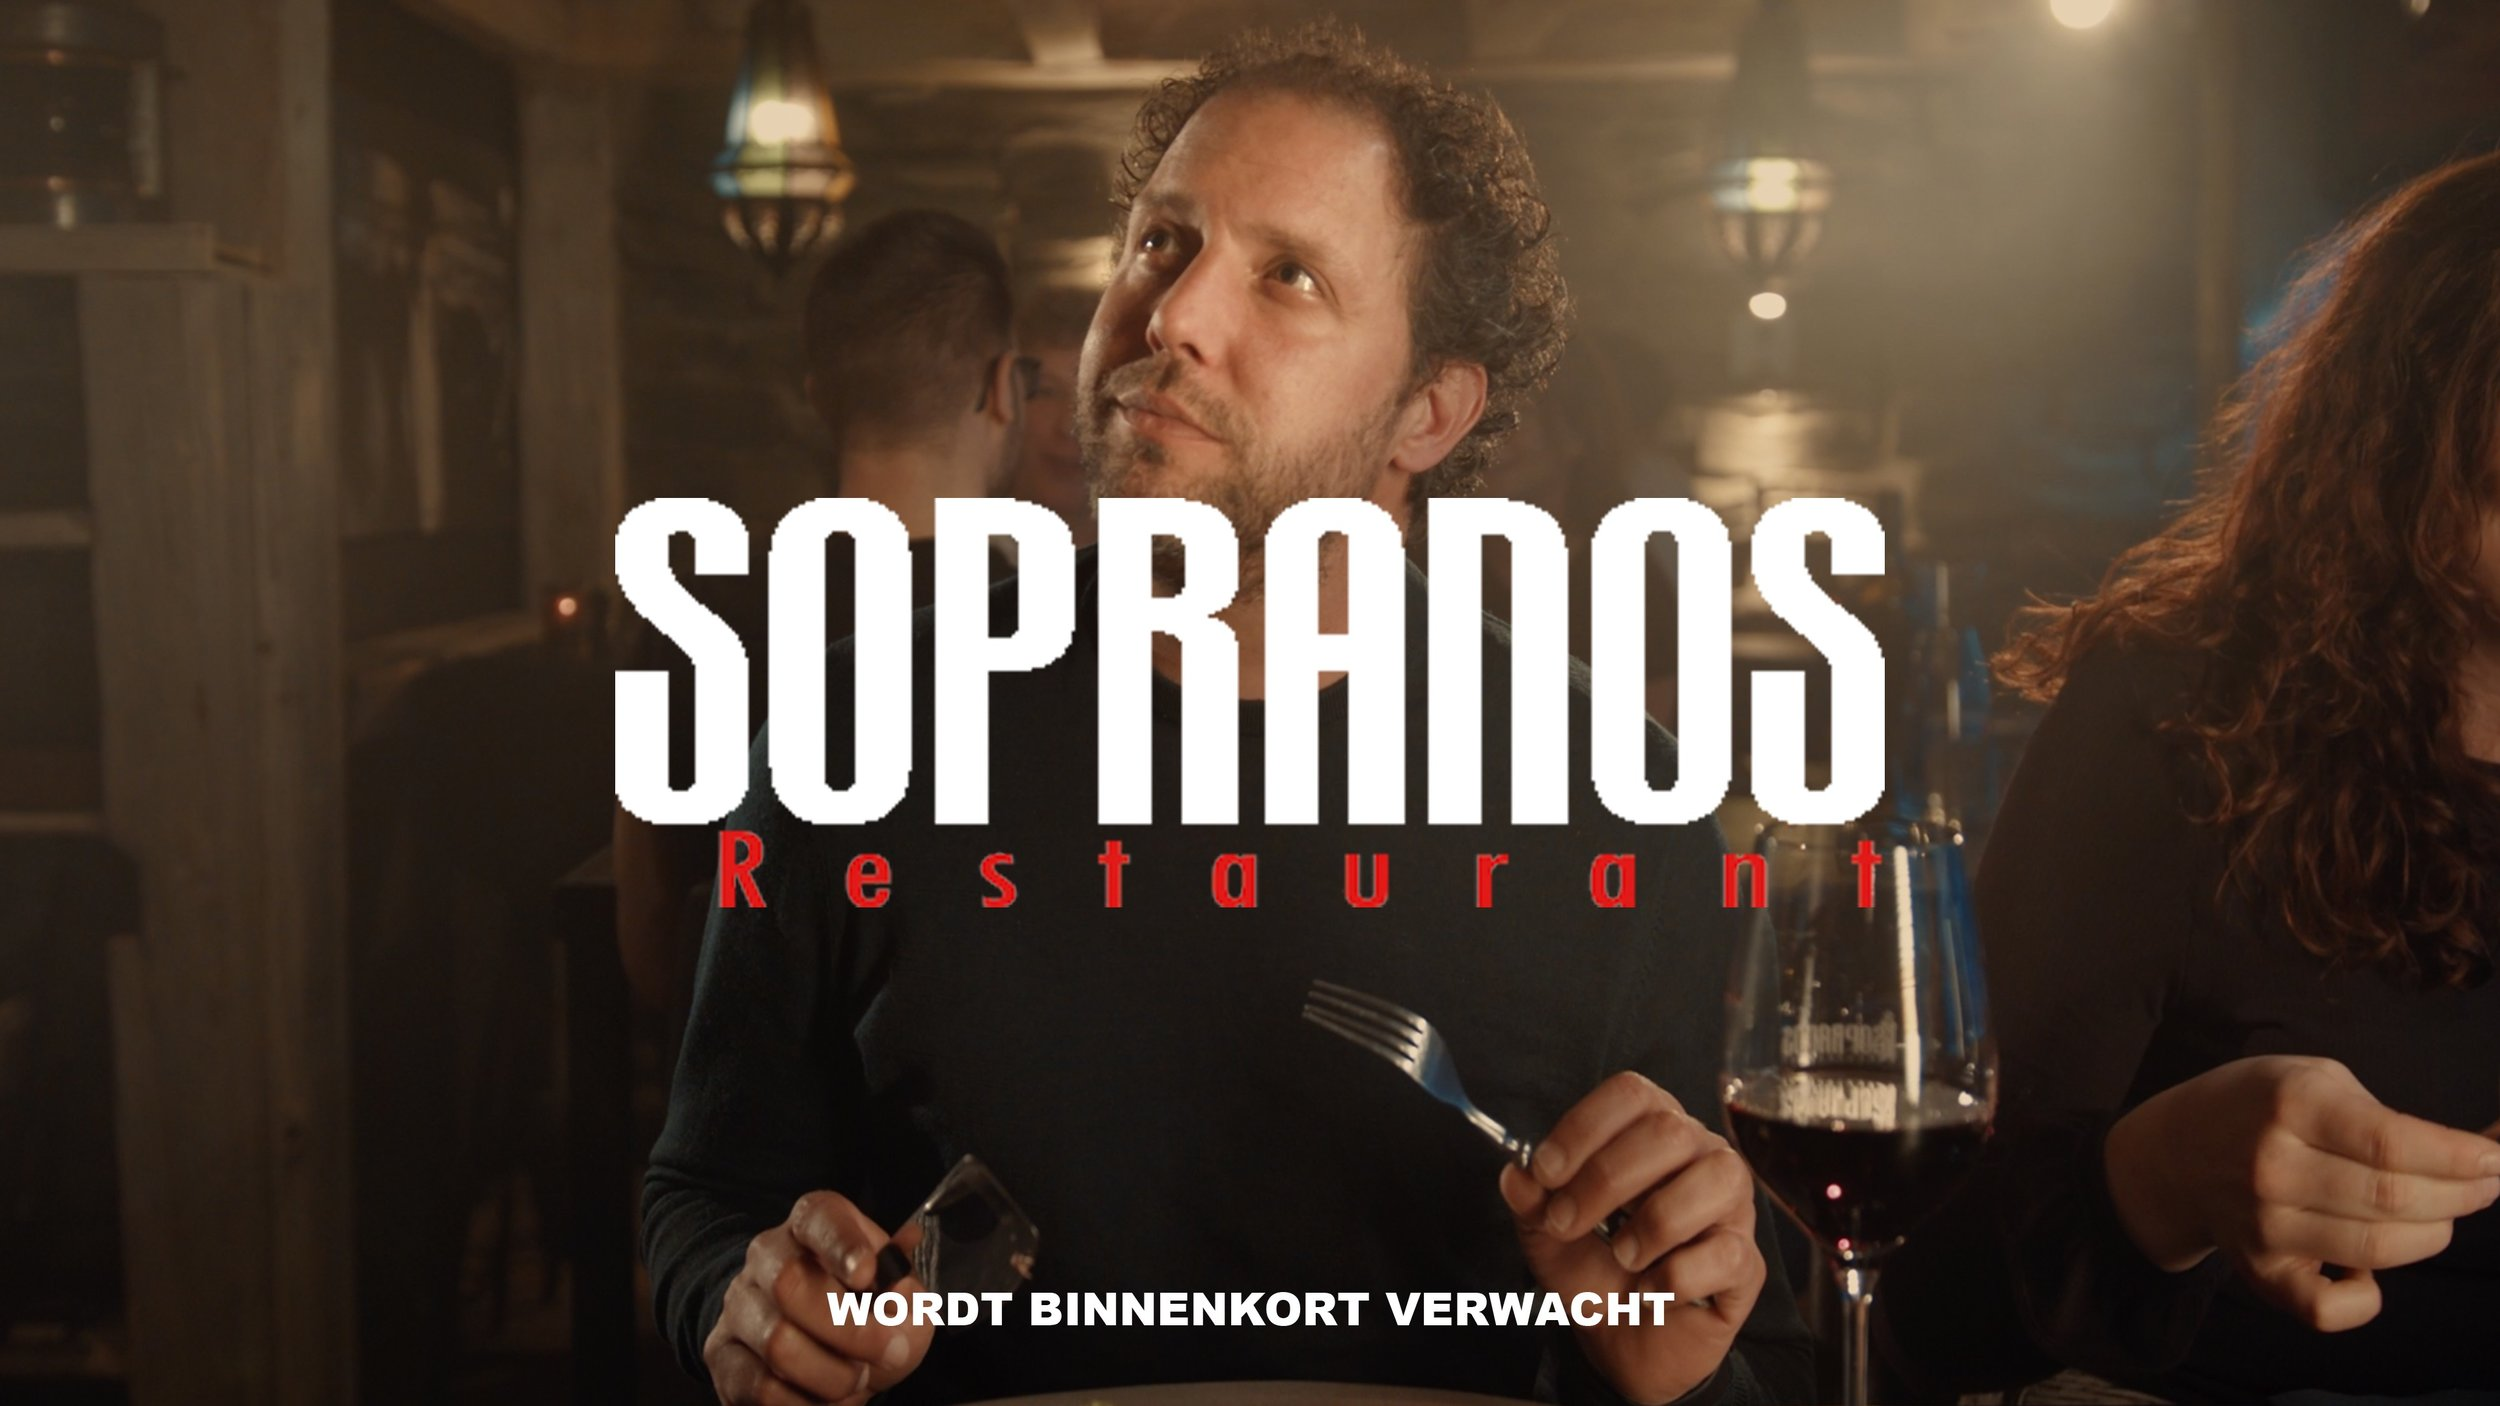 T_Sopranos-squashed.jpg